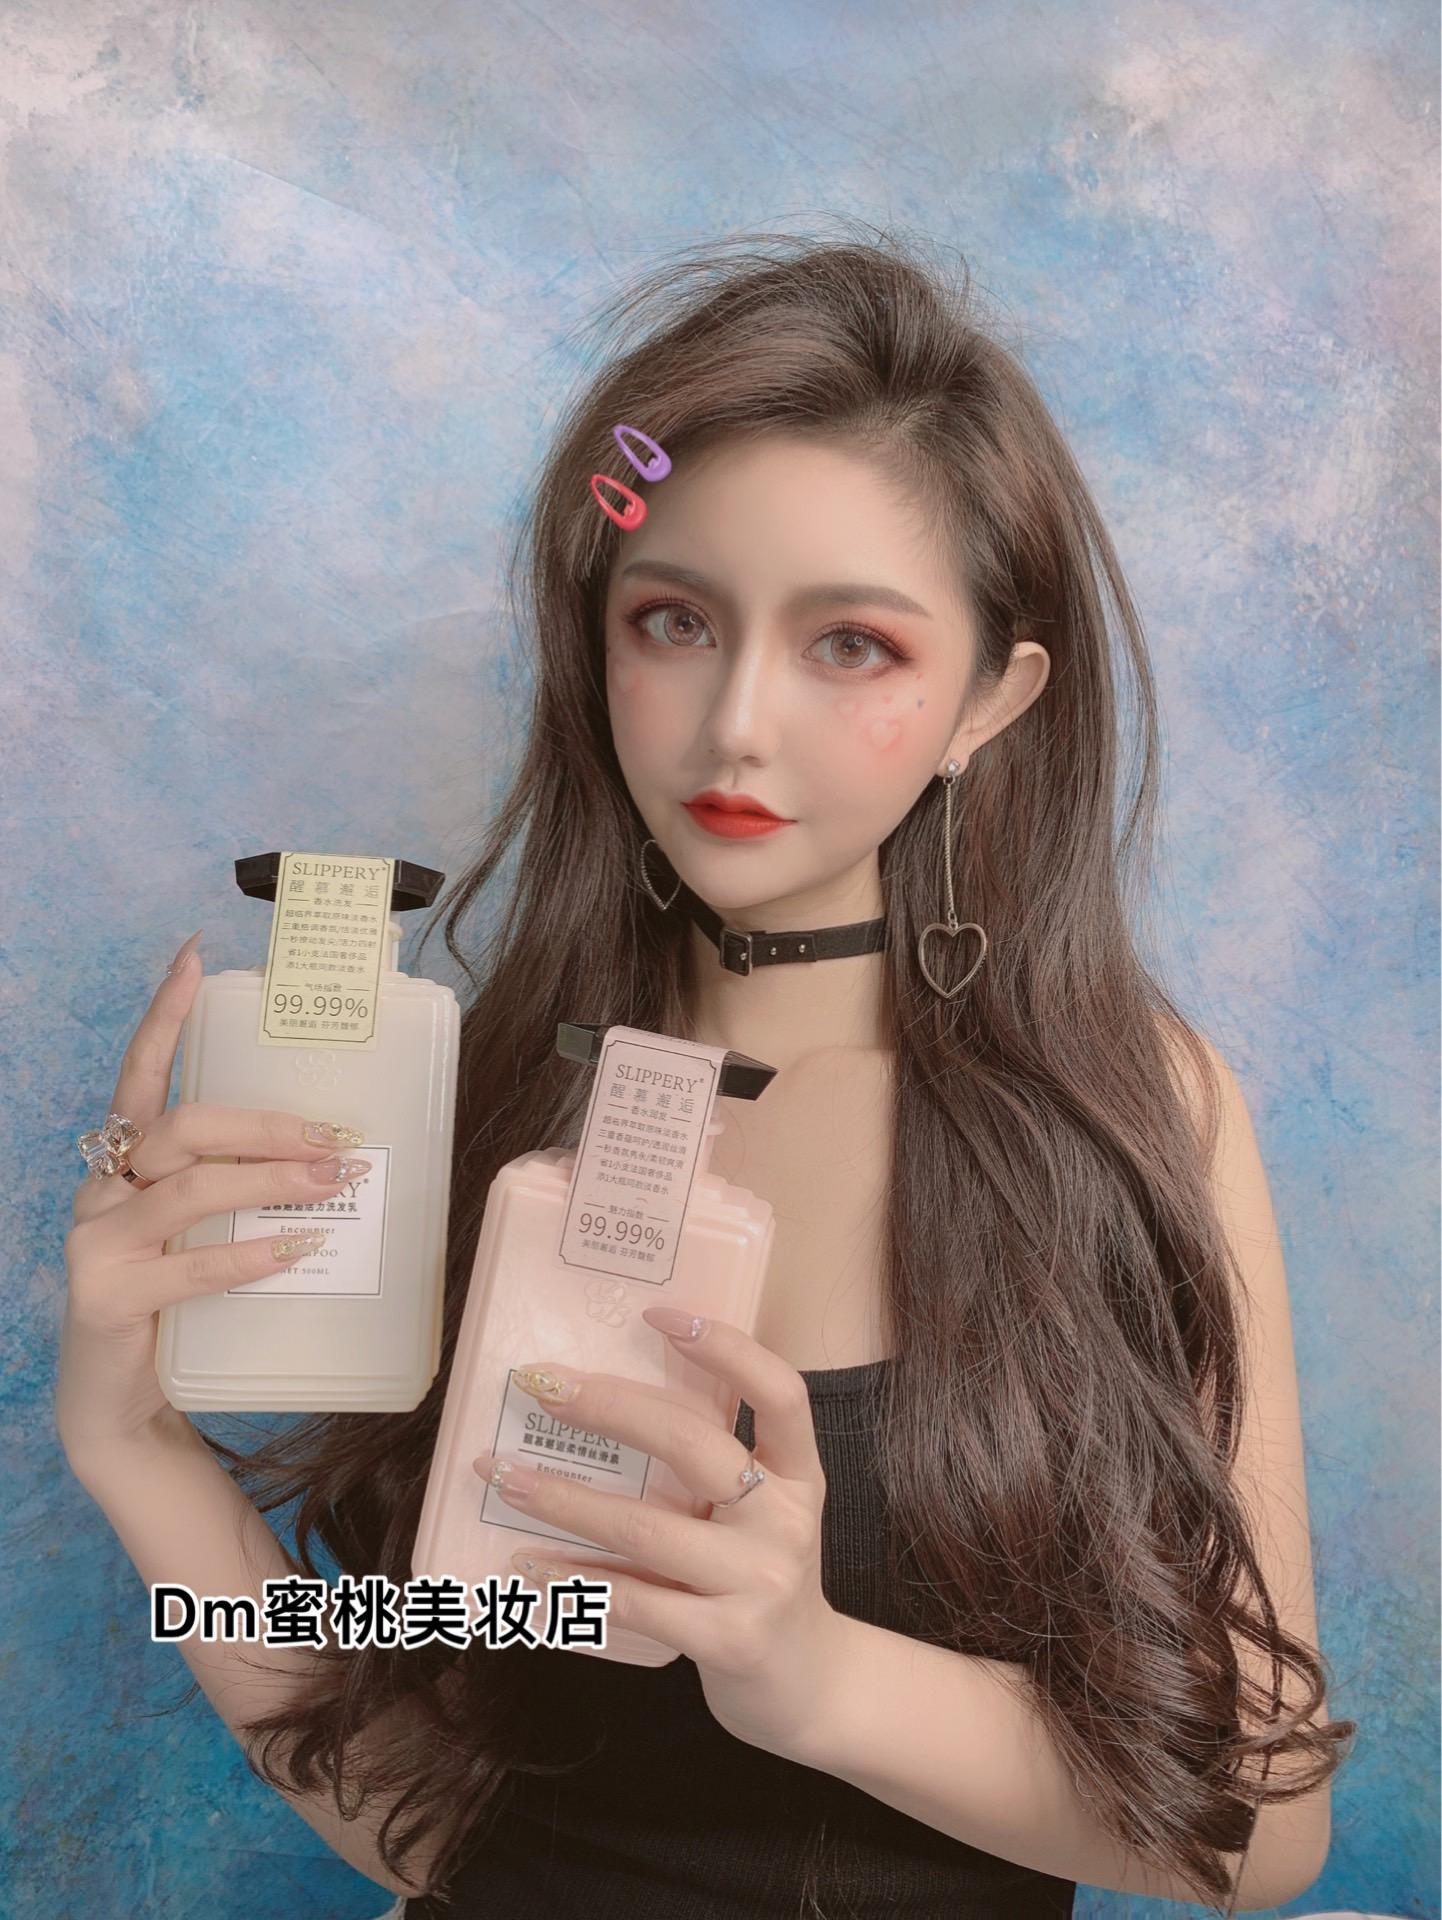 Dm蜜桃同款洗发护发 洗发乳 护发素